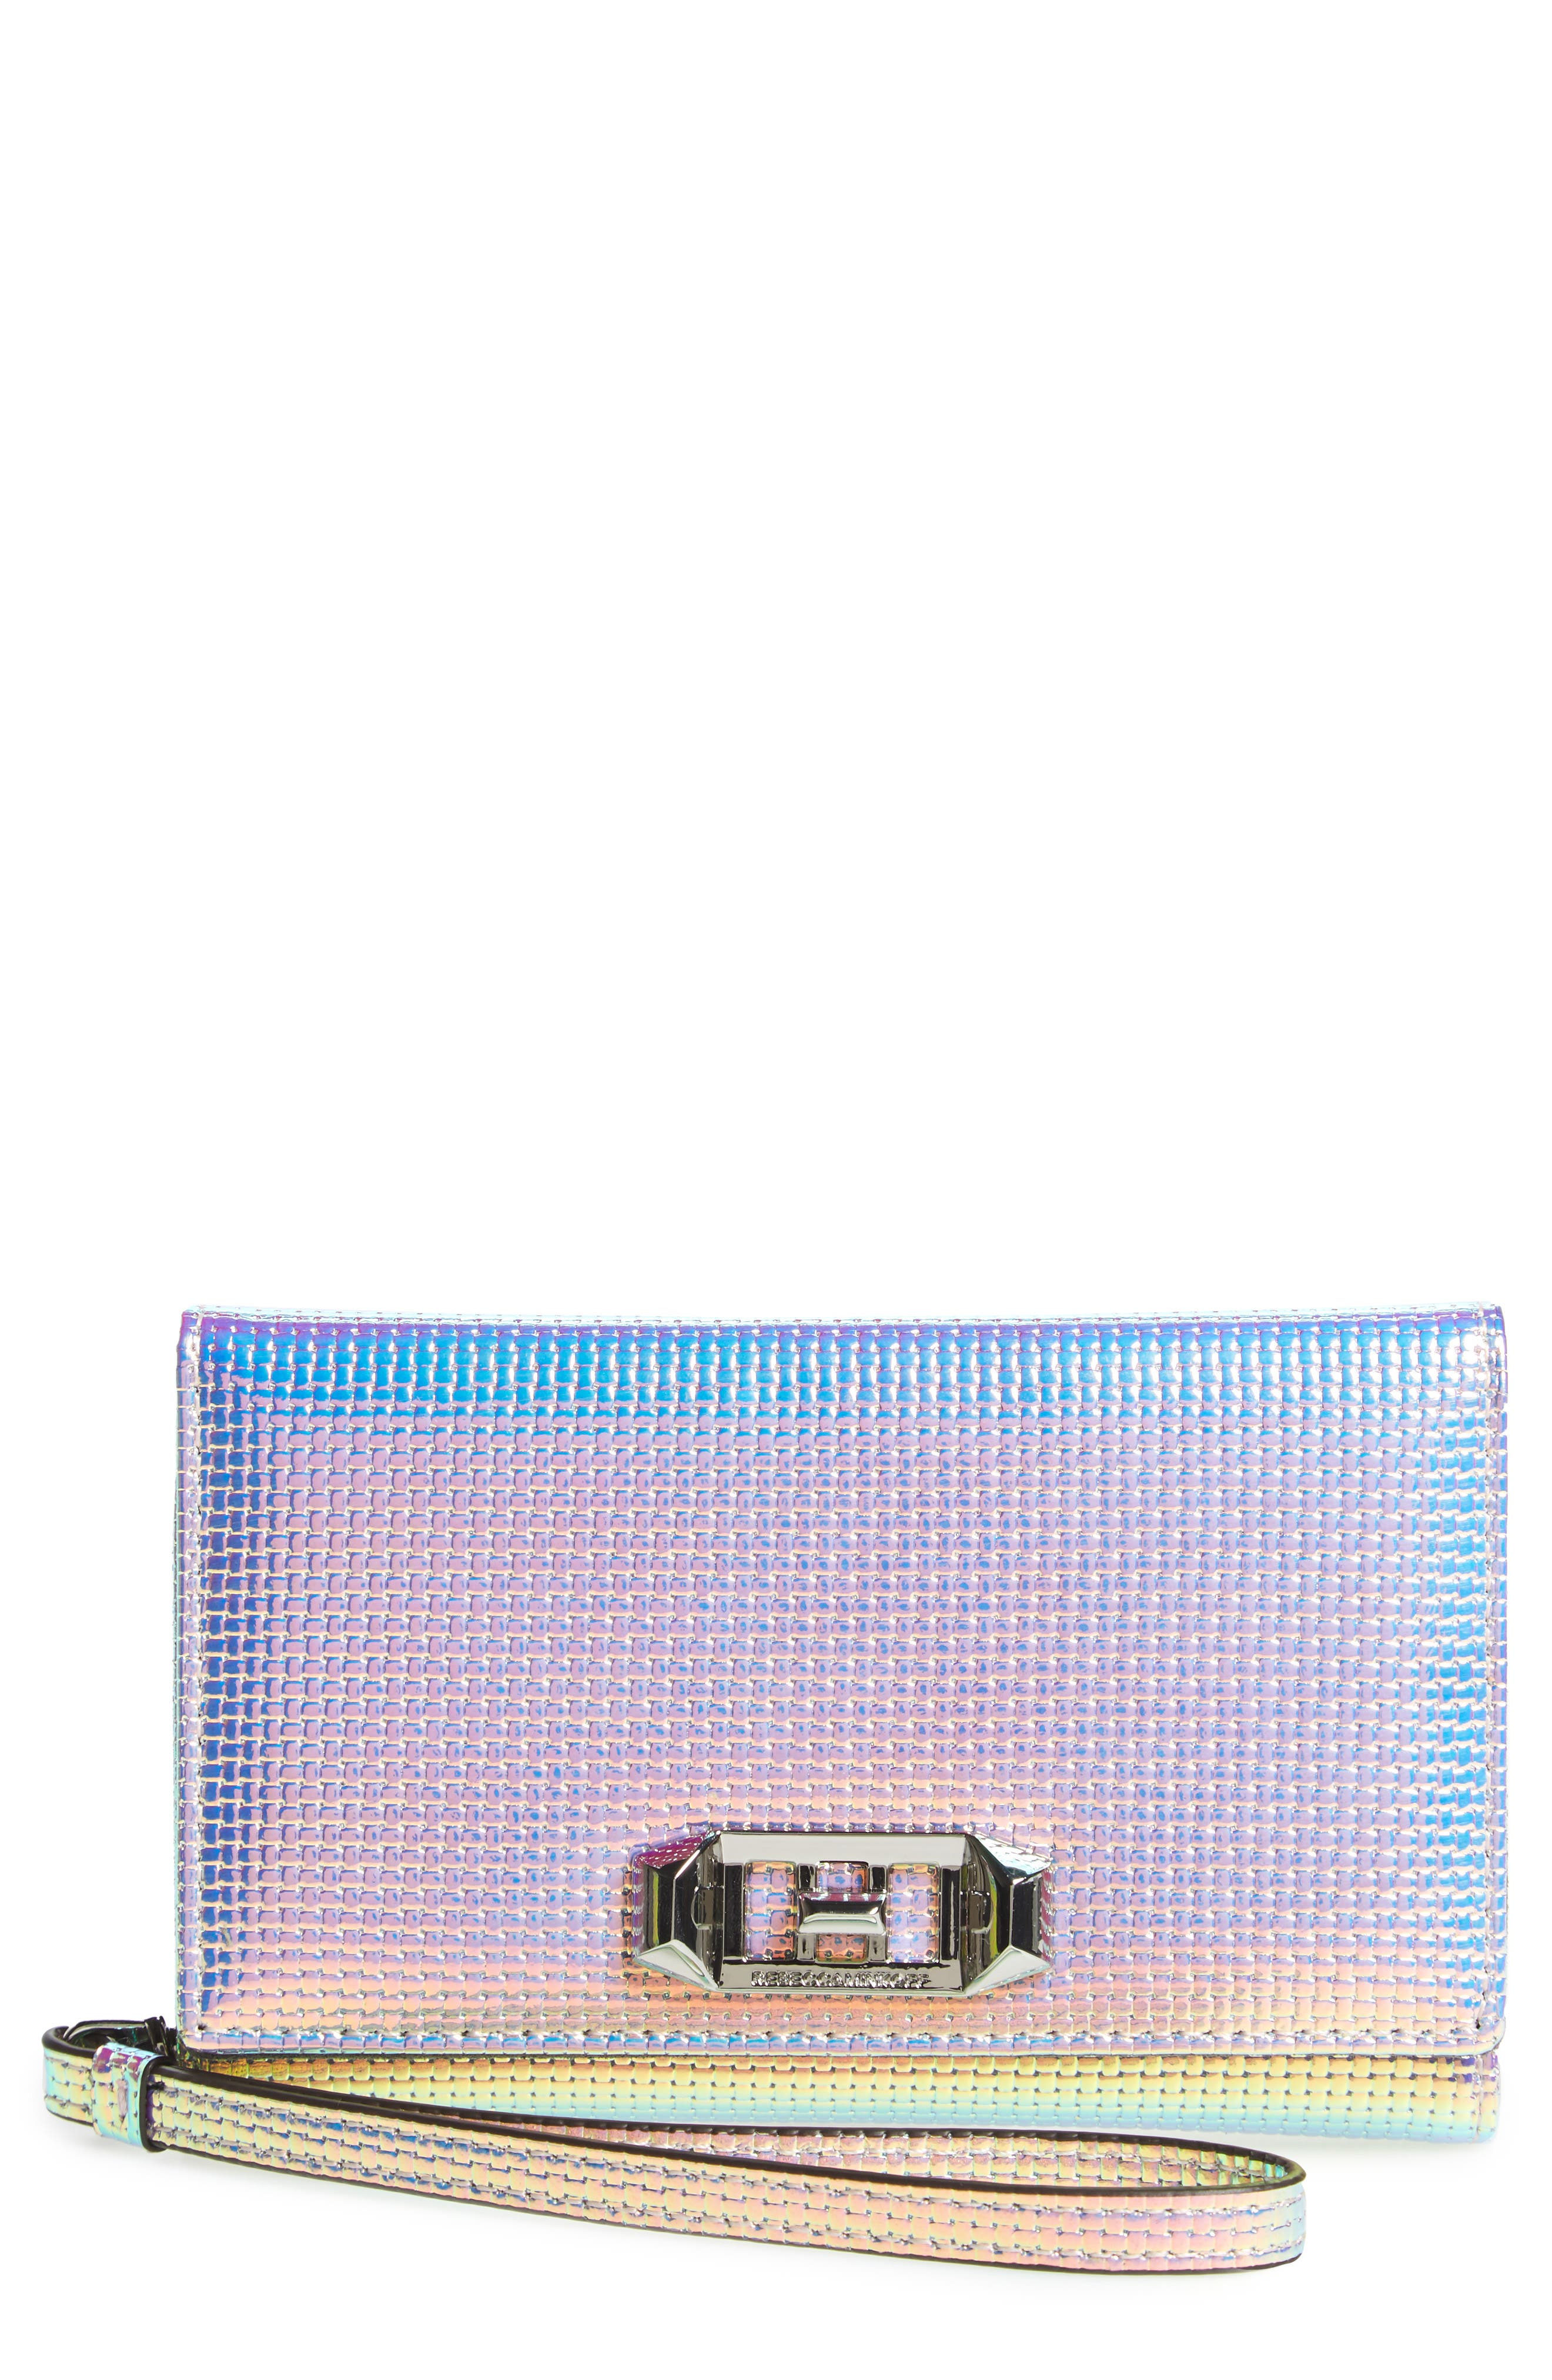 Rebecca Minkoff Love Lock iPhone X Metallic Leather Wristlet Folio